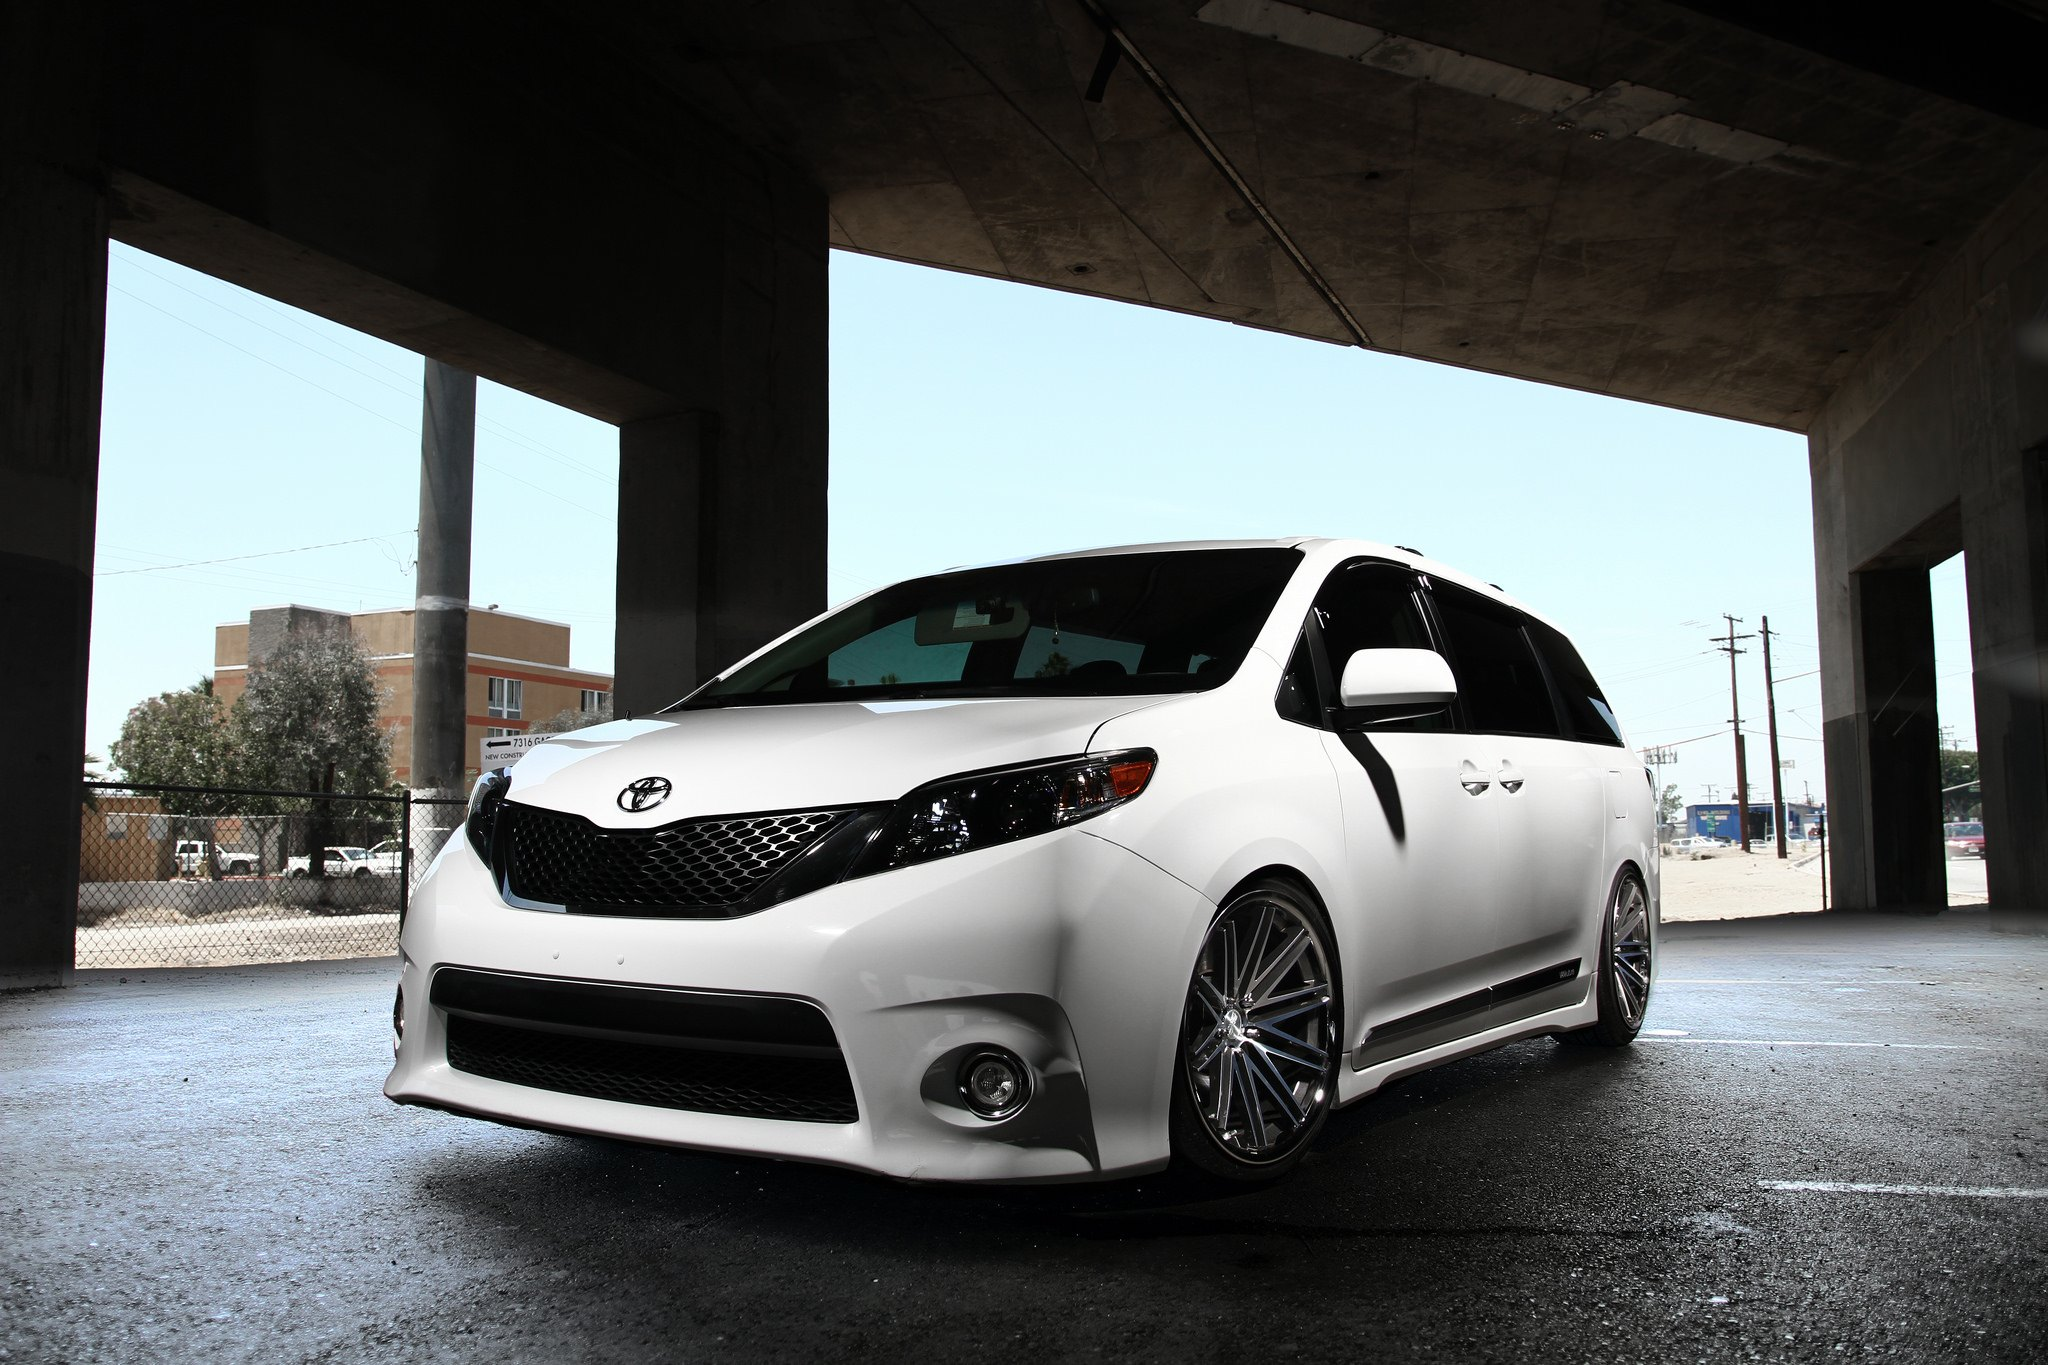 2011 Toyota Camry White >> Custom 2018 Toyota Sienna | Images, Mods, Photos, Upgrades — CARiD.com Gallery